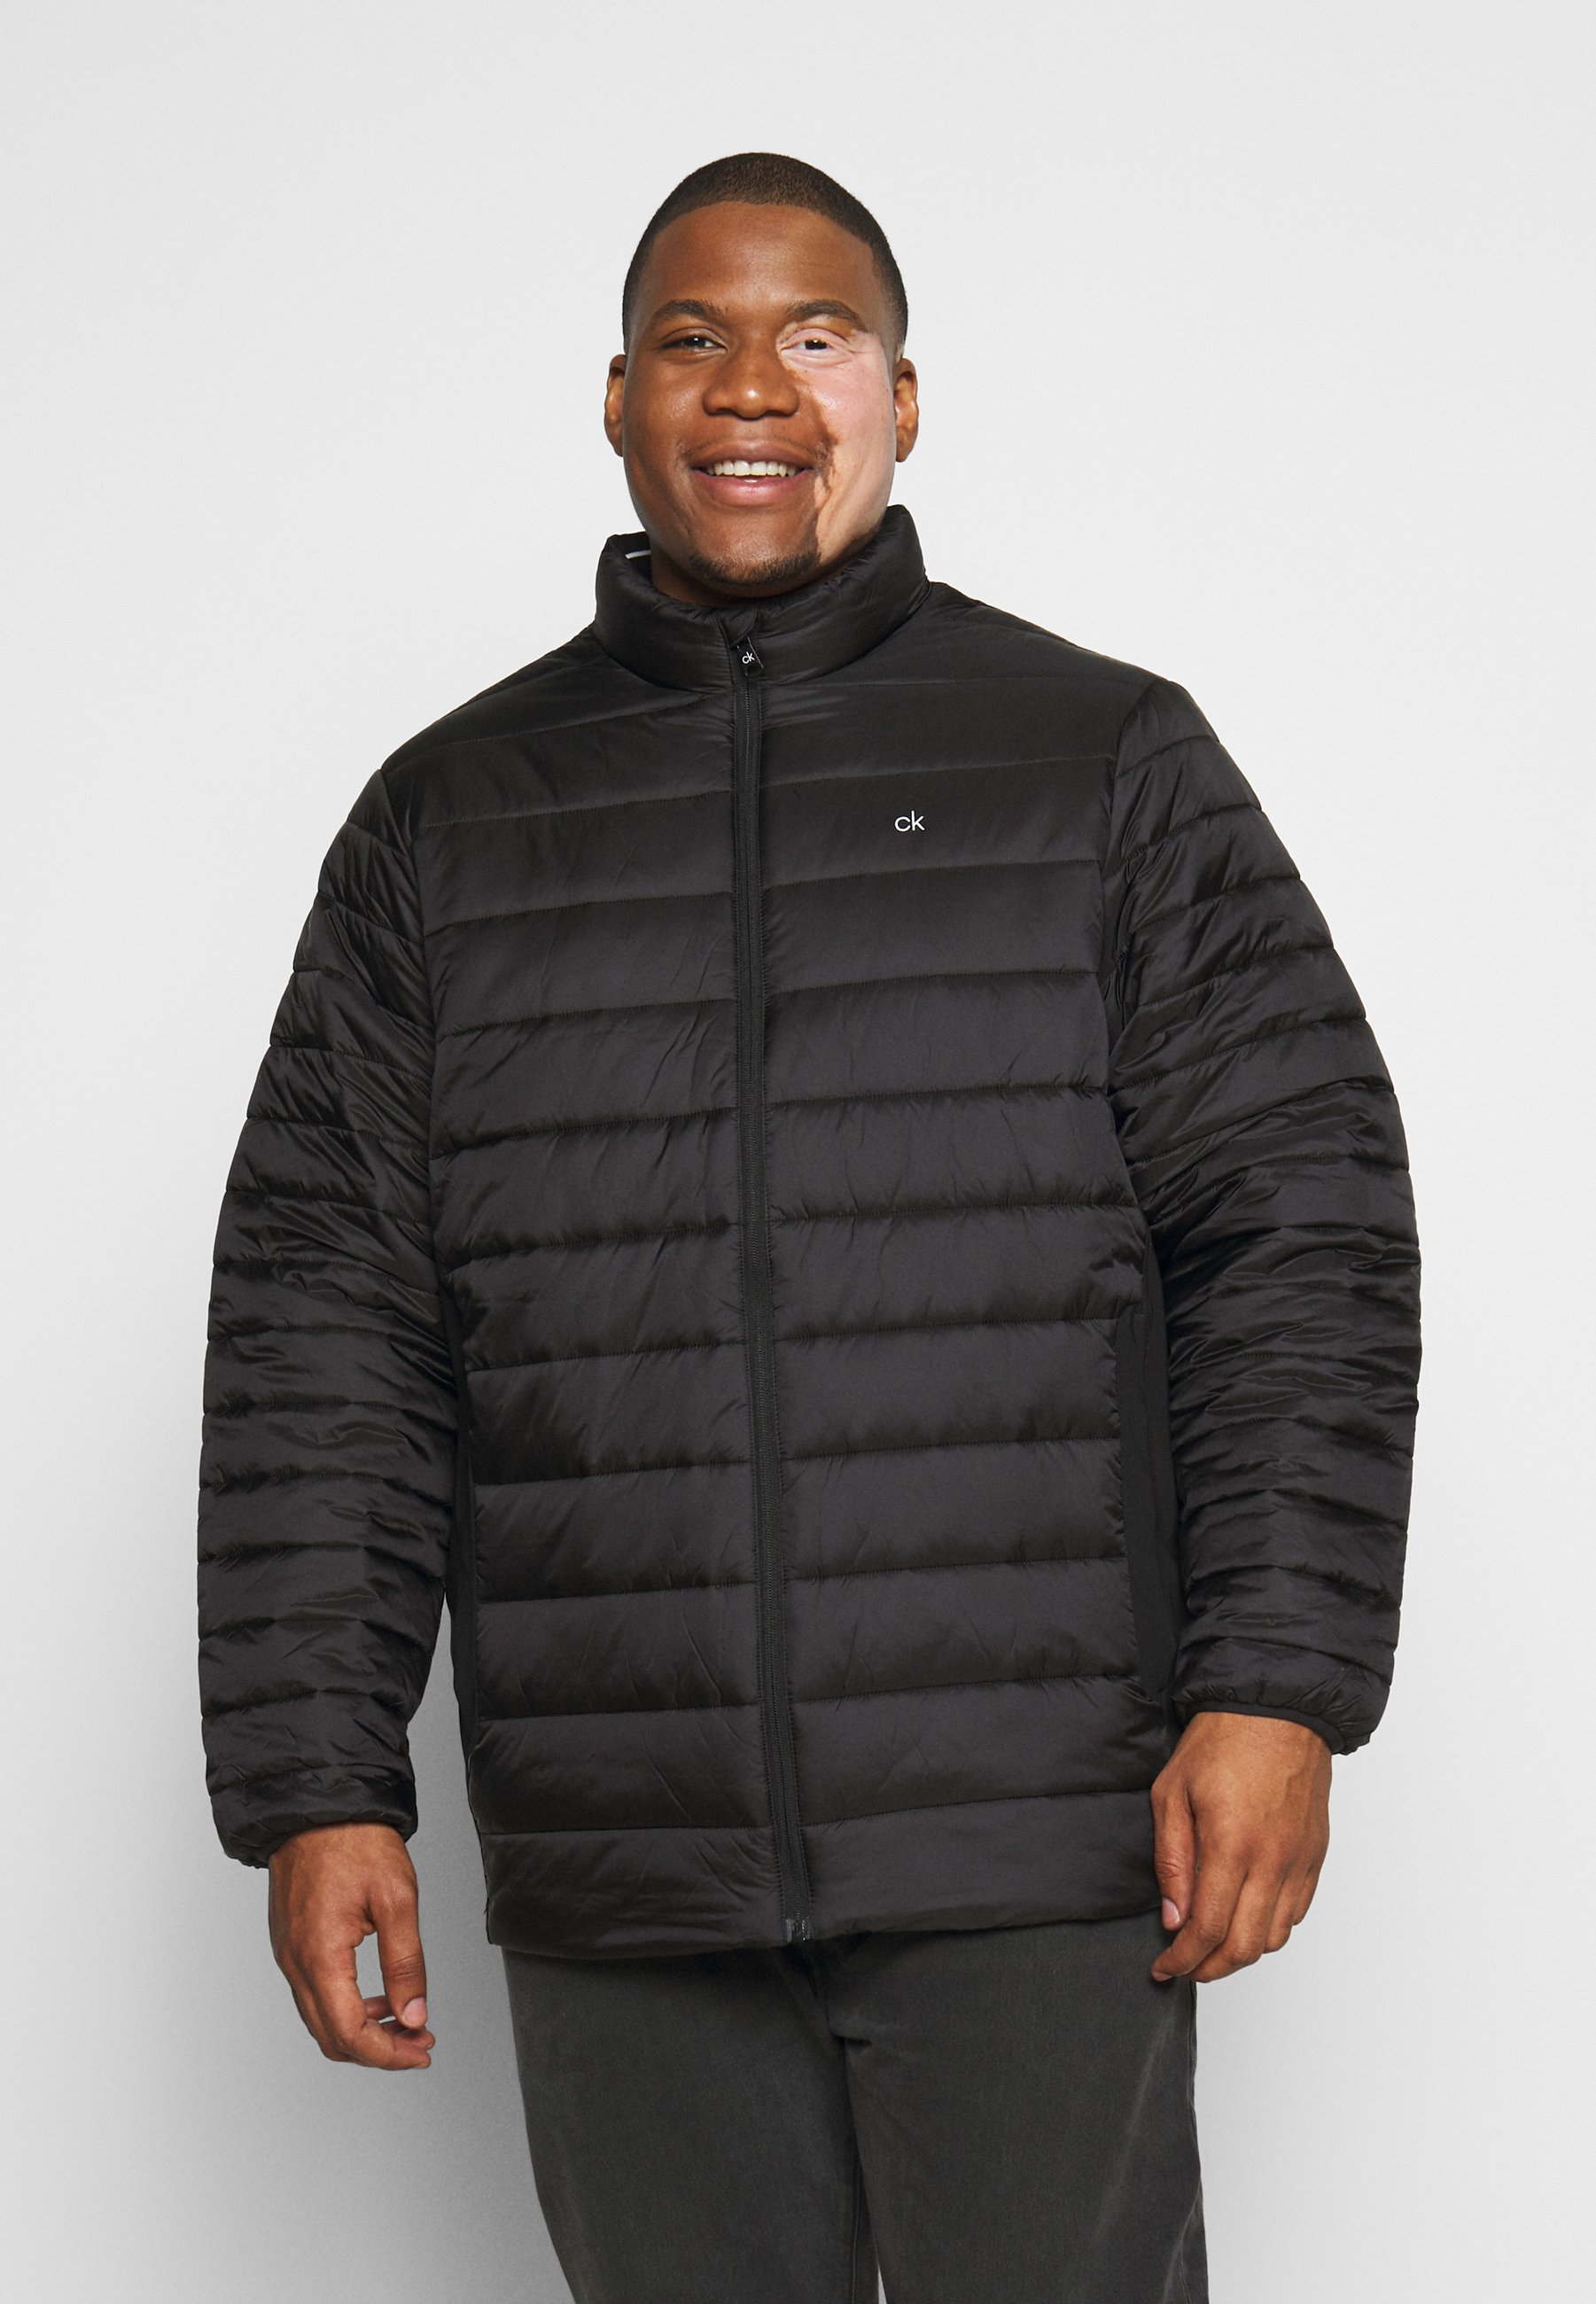 Particular Discount Wholesale Calvin Klein LIGHT WEIGHT SIDE LOGO JACKET - Winter jacket - black | men's clothing 2020 HYadK